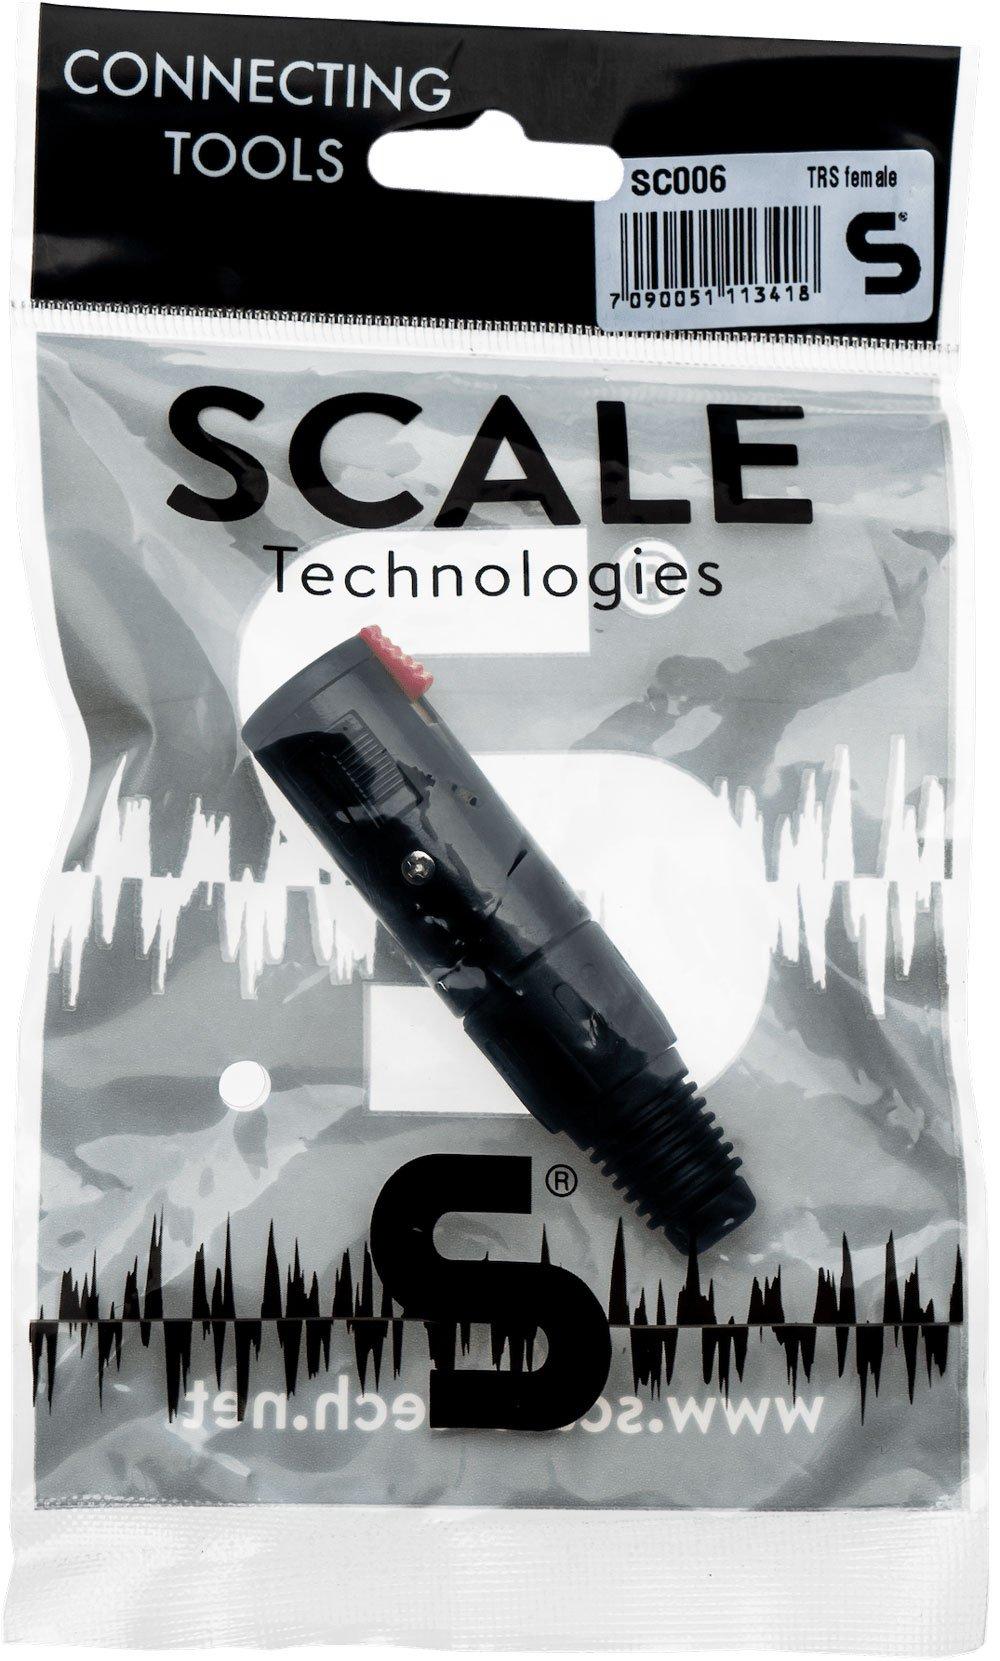 Scale Technologies SC006 - TRS Female